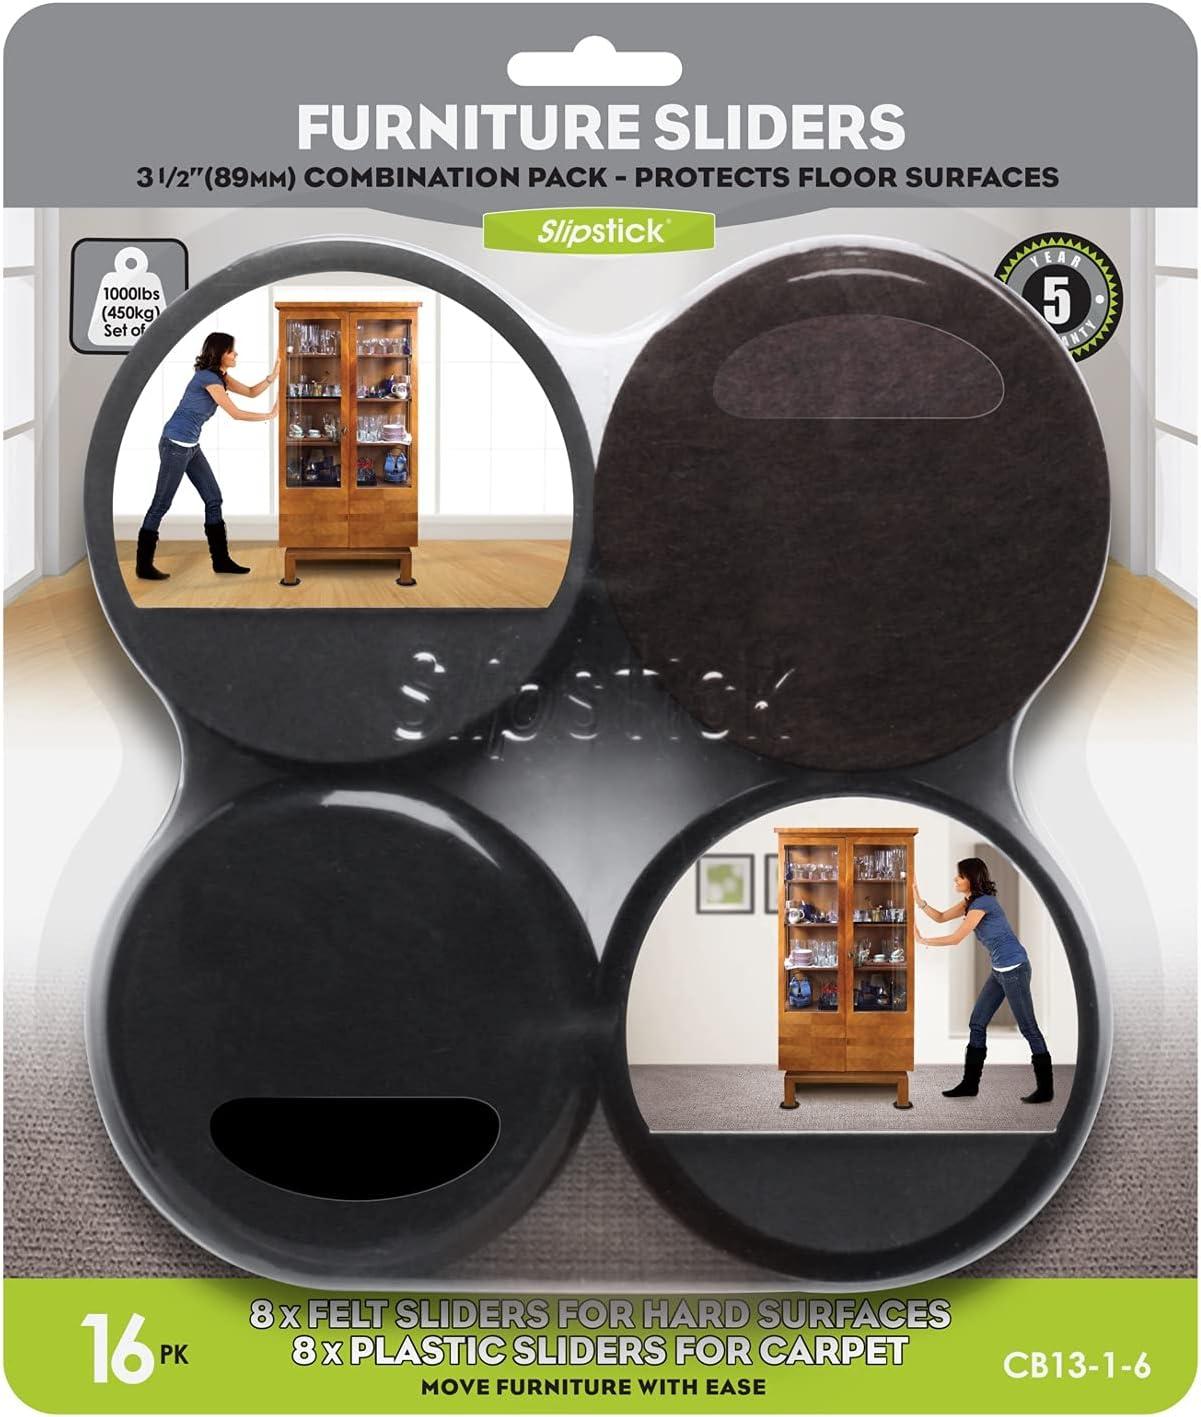 "Slipstick Premium Furniture Sliders for All Floor Surfaces (16 Piece Moving Kit) Reusable 3.5"" Round Furniture Movers for Sliding Furniture on Hardwood & Carpet, Black, CB13-1-16"